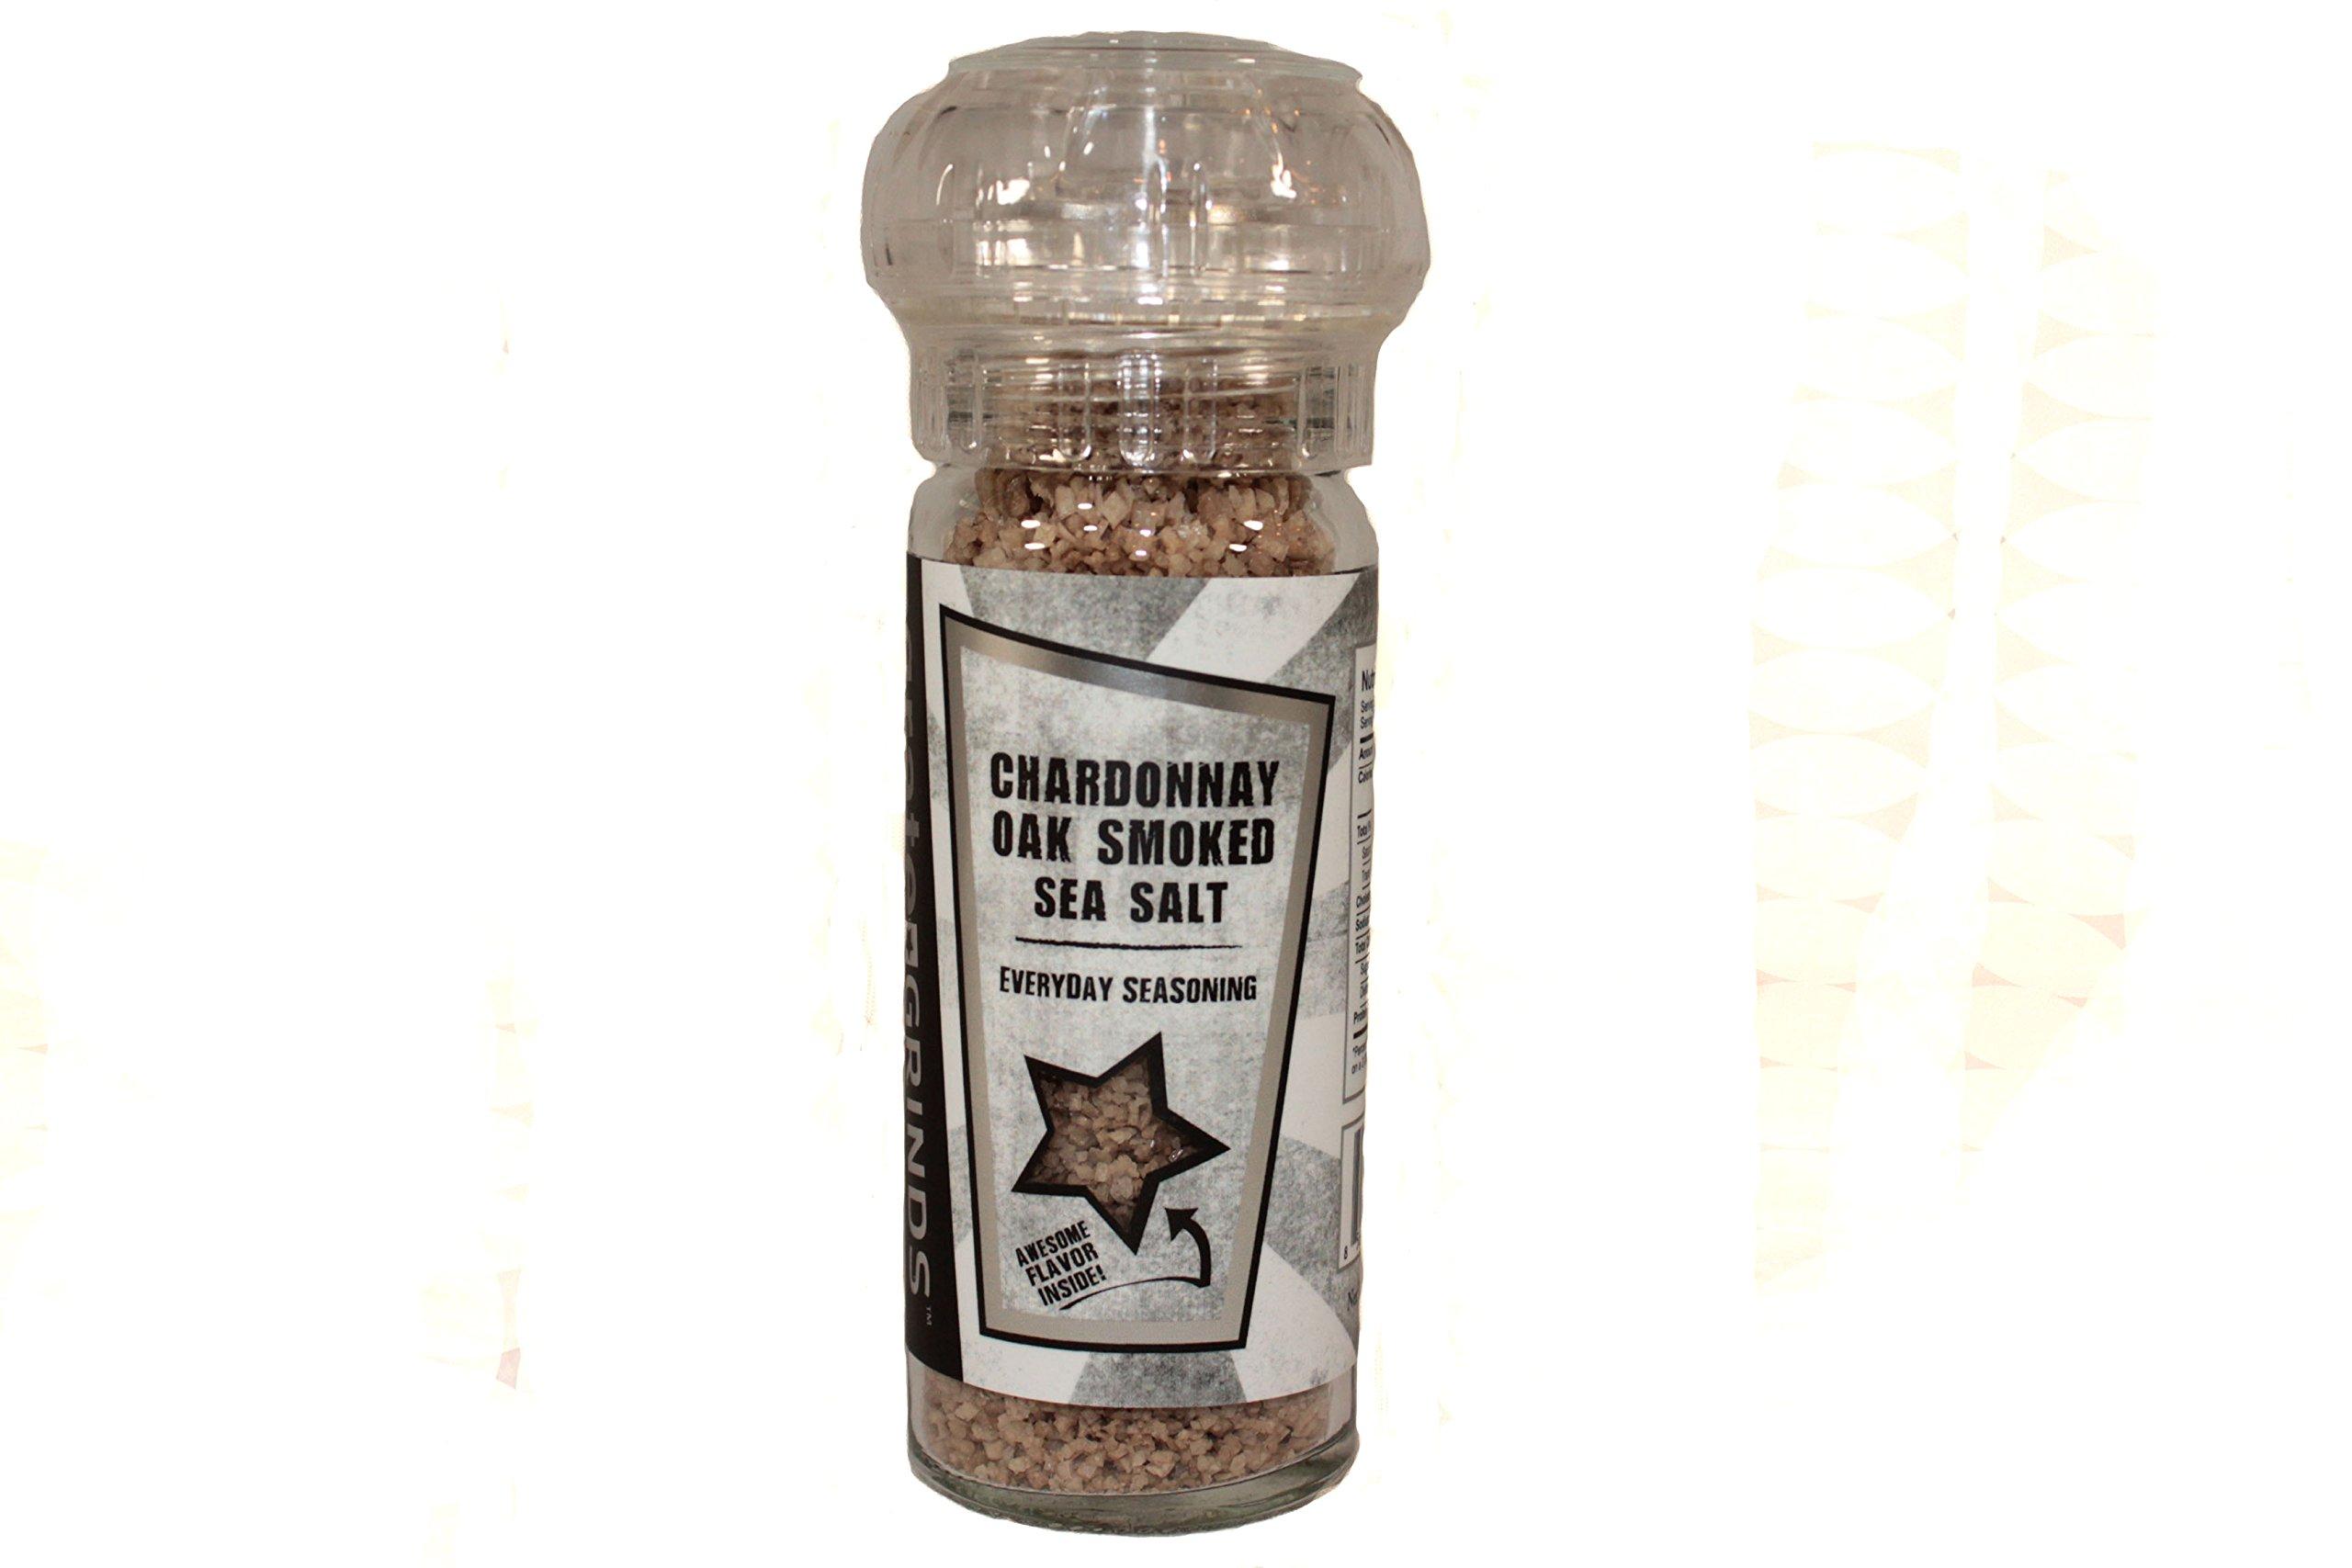 Chardonnay Oak Smoked Sea Salt in a refillable spice grinder bottle